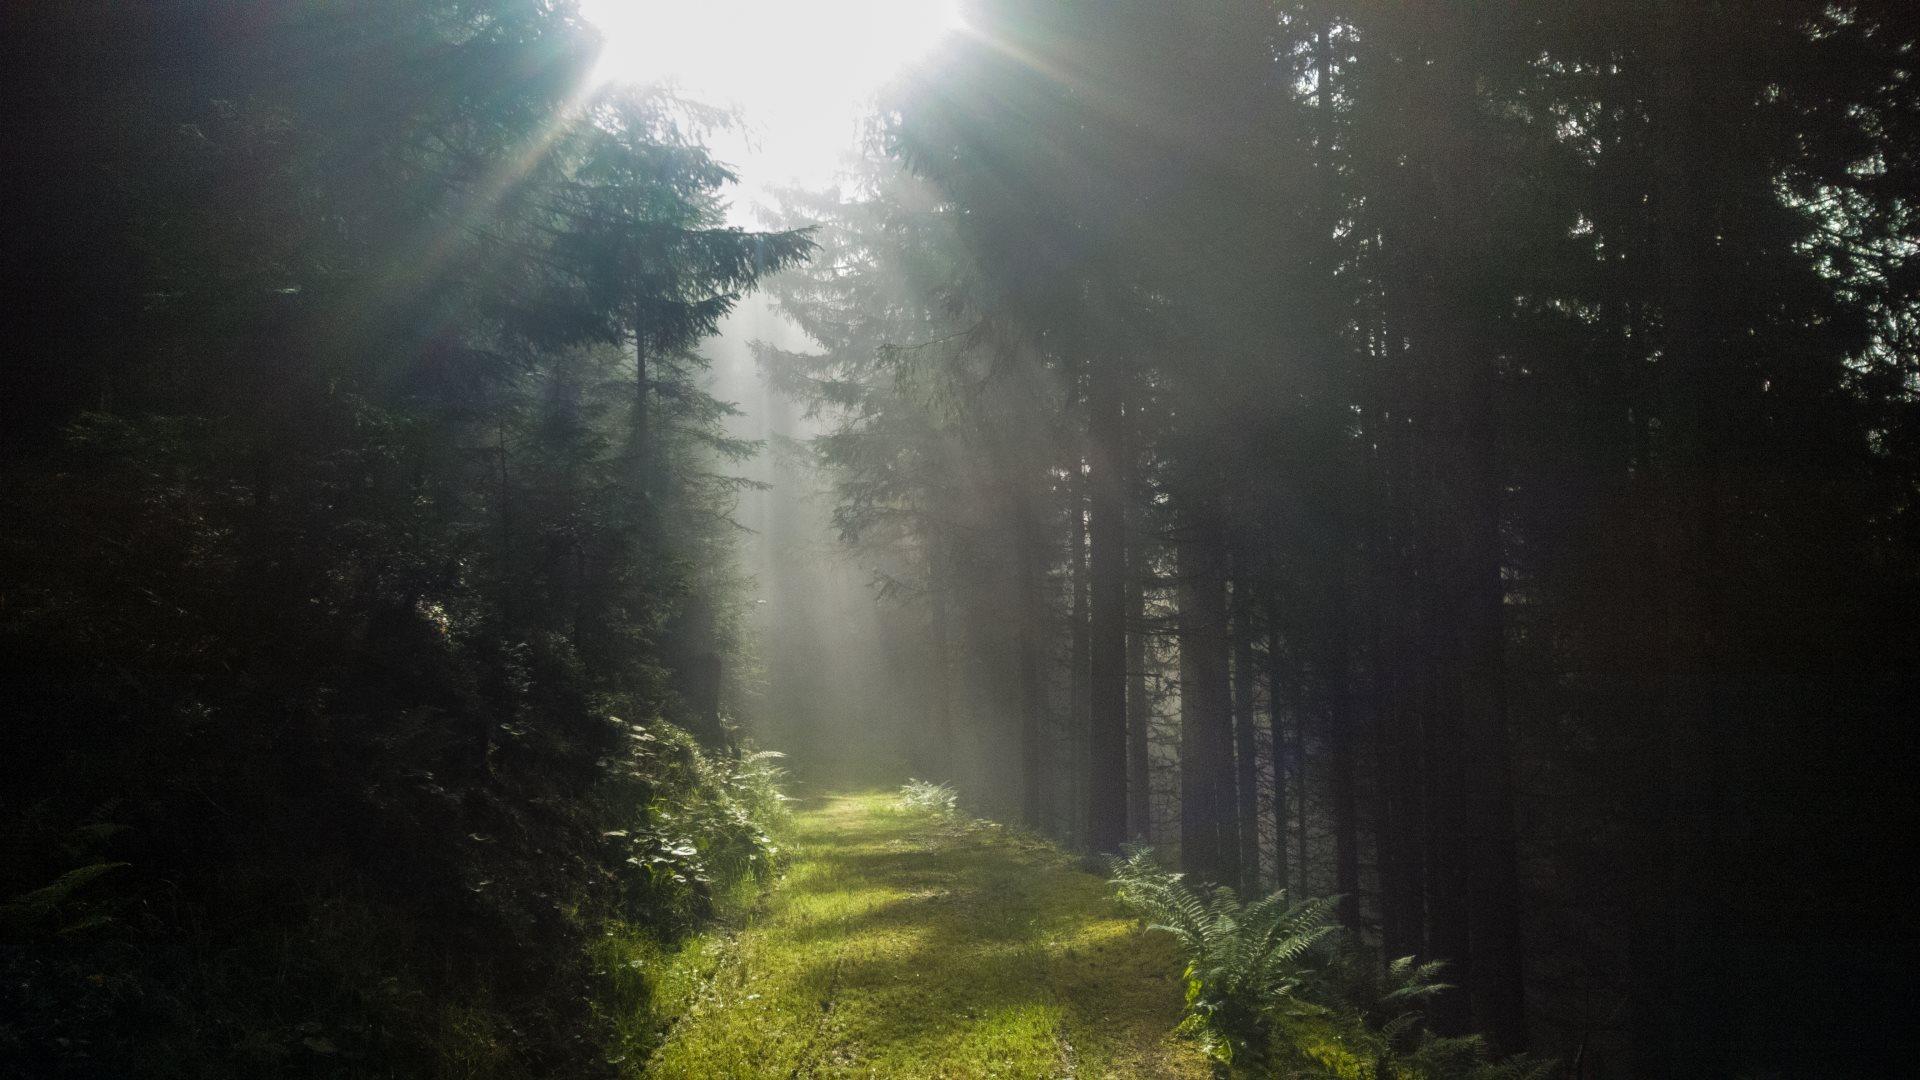 Light path through the dark forest_HD